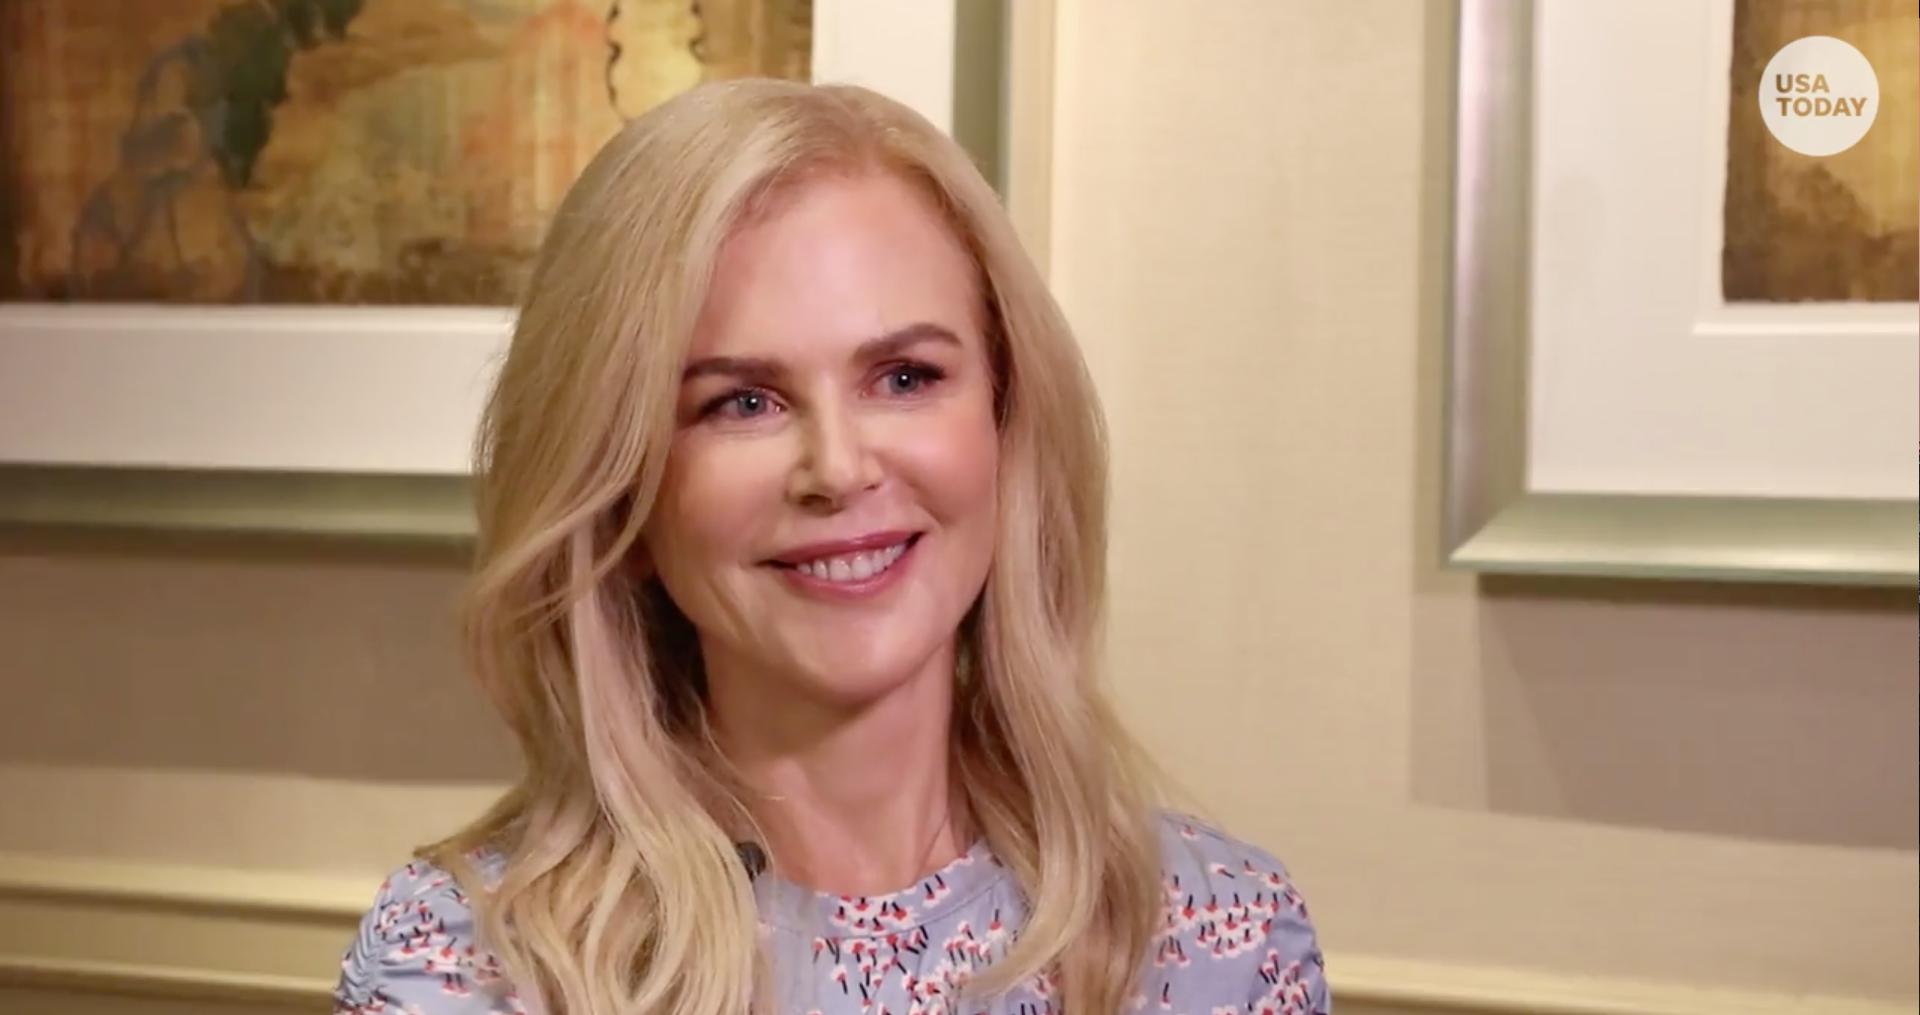 Why Nicole Kidman's Christmas won't be like yours